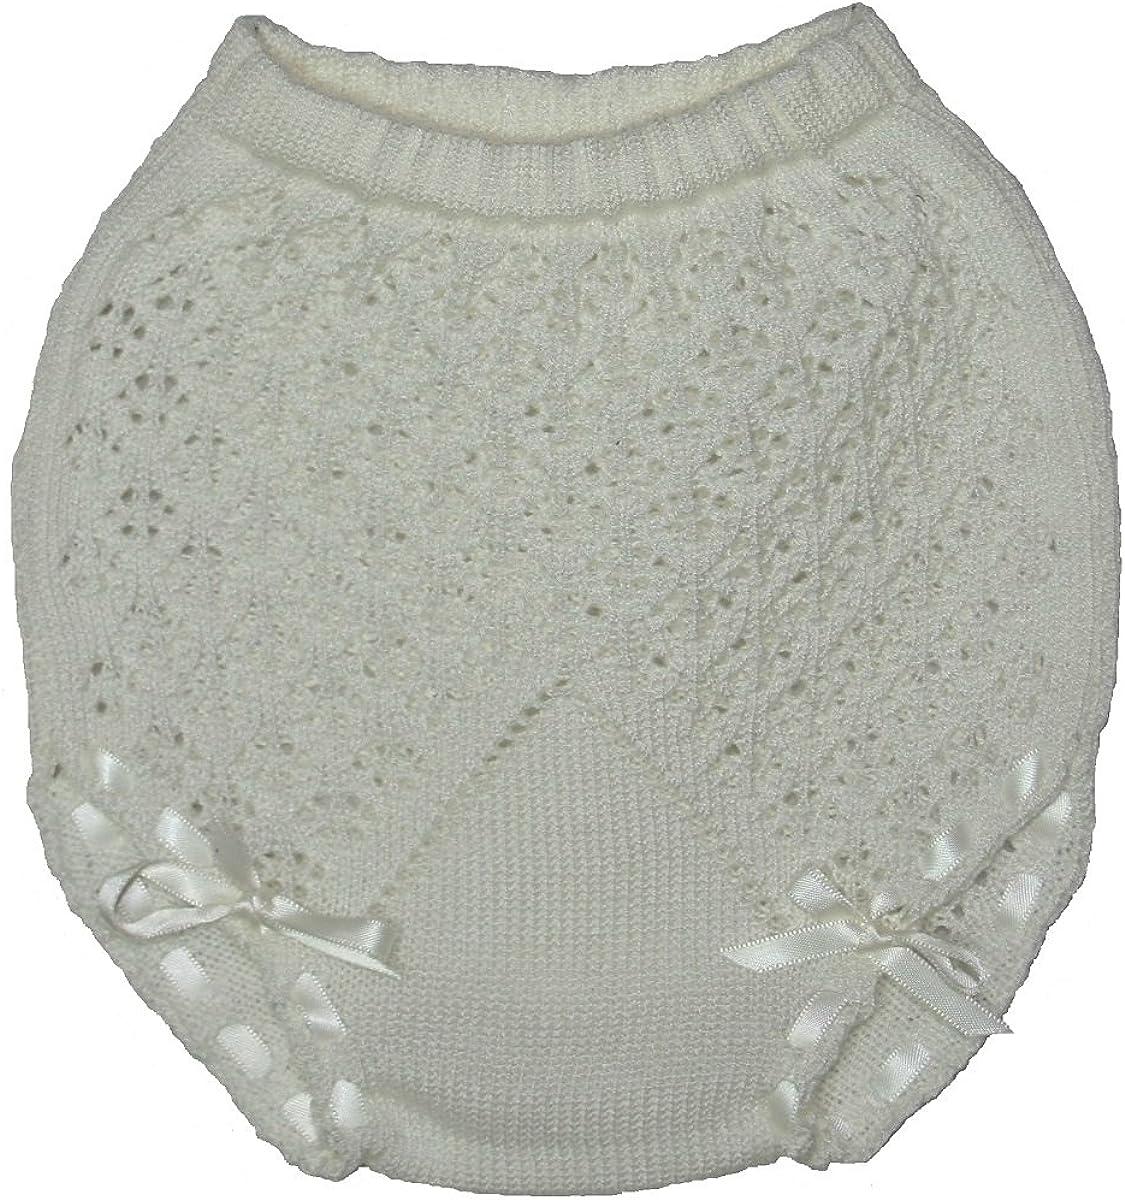 Dimosa Braga cubrepa/ñal Calado en Perle acrilico.